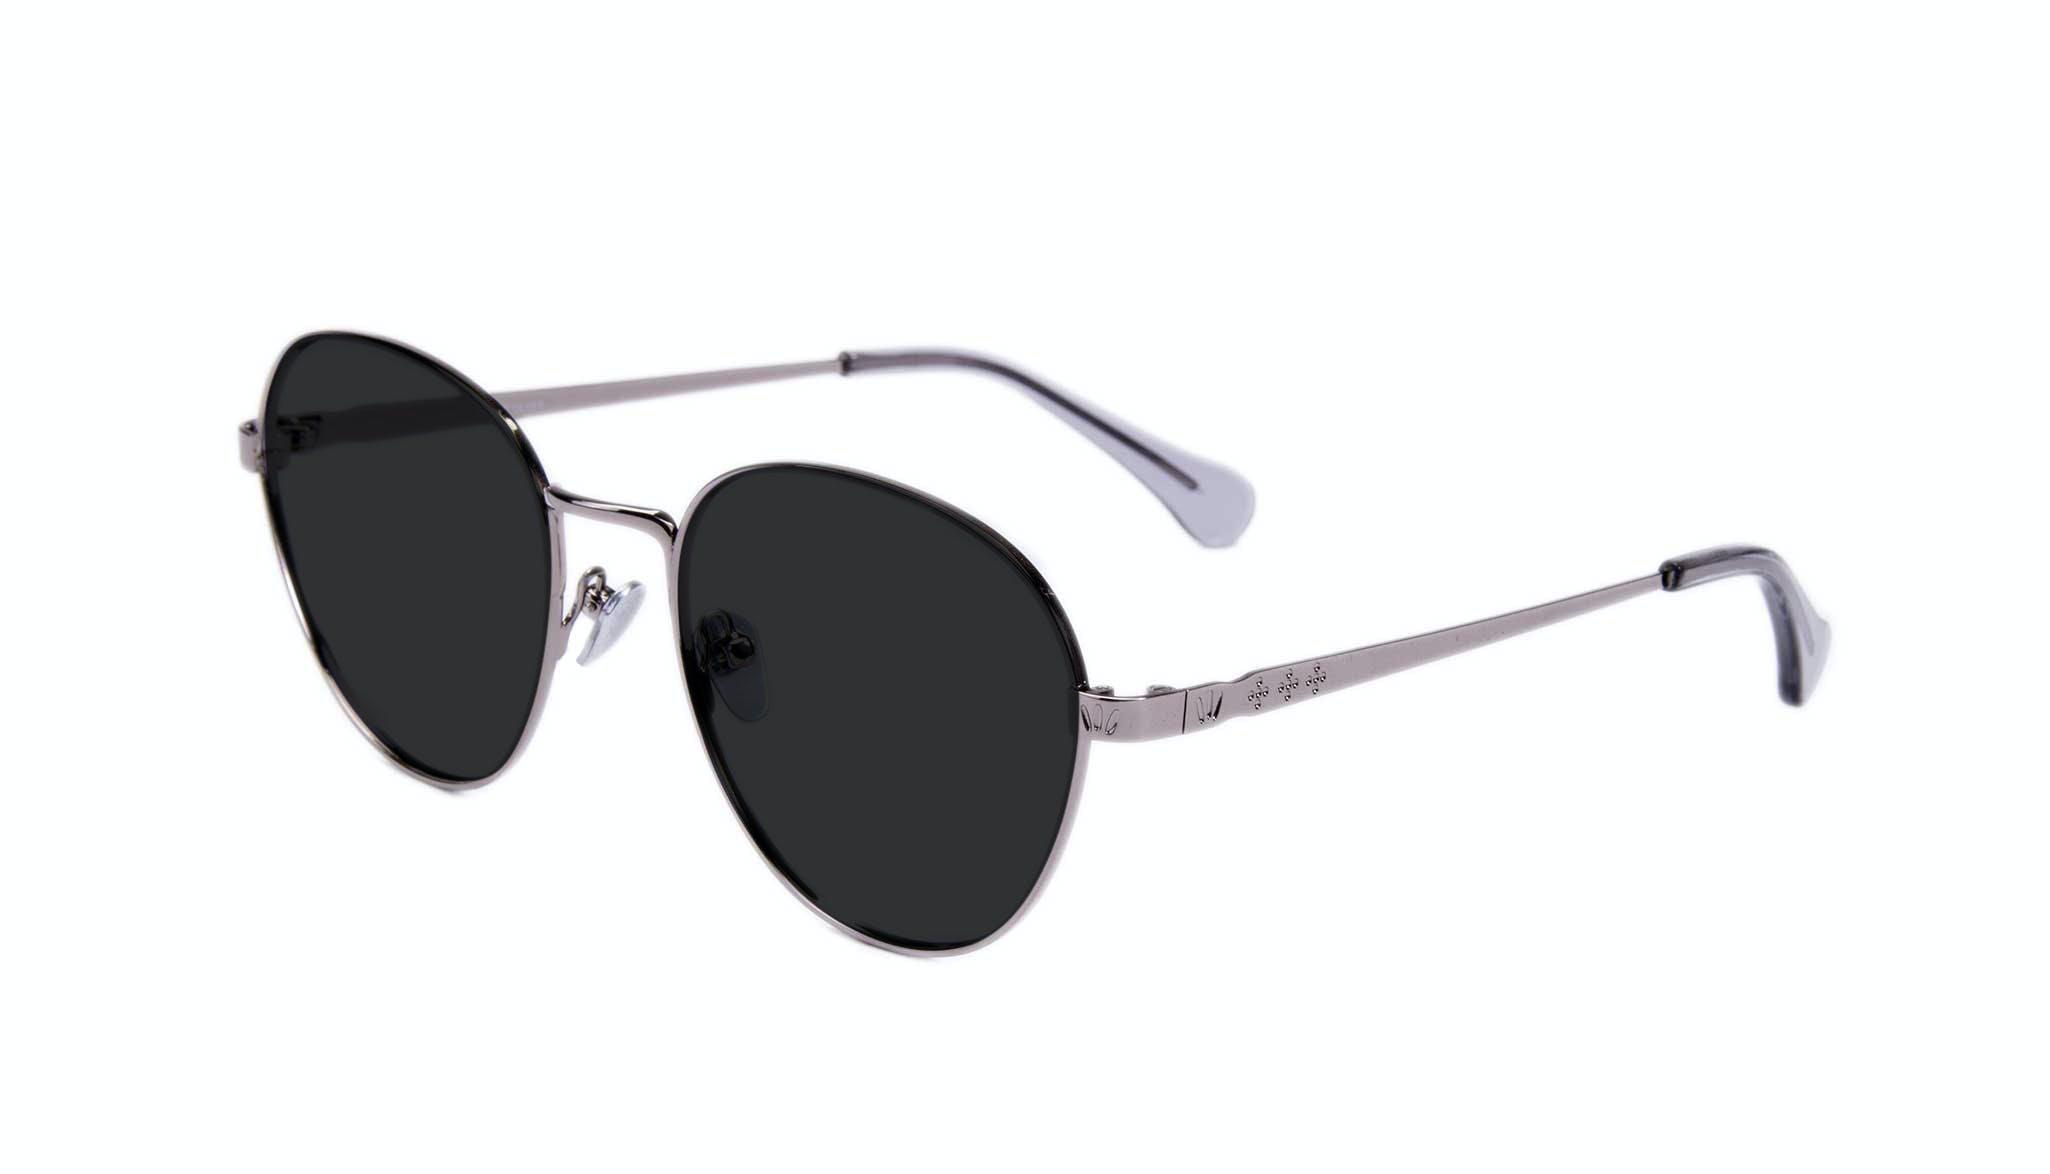 Affordable Fashion Glasses Round Sunglasses Women Brace Silver Tilt